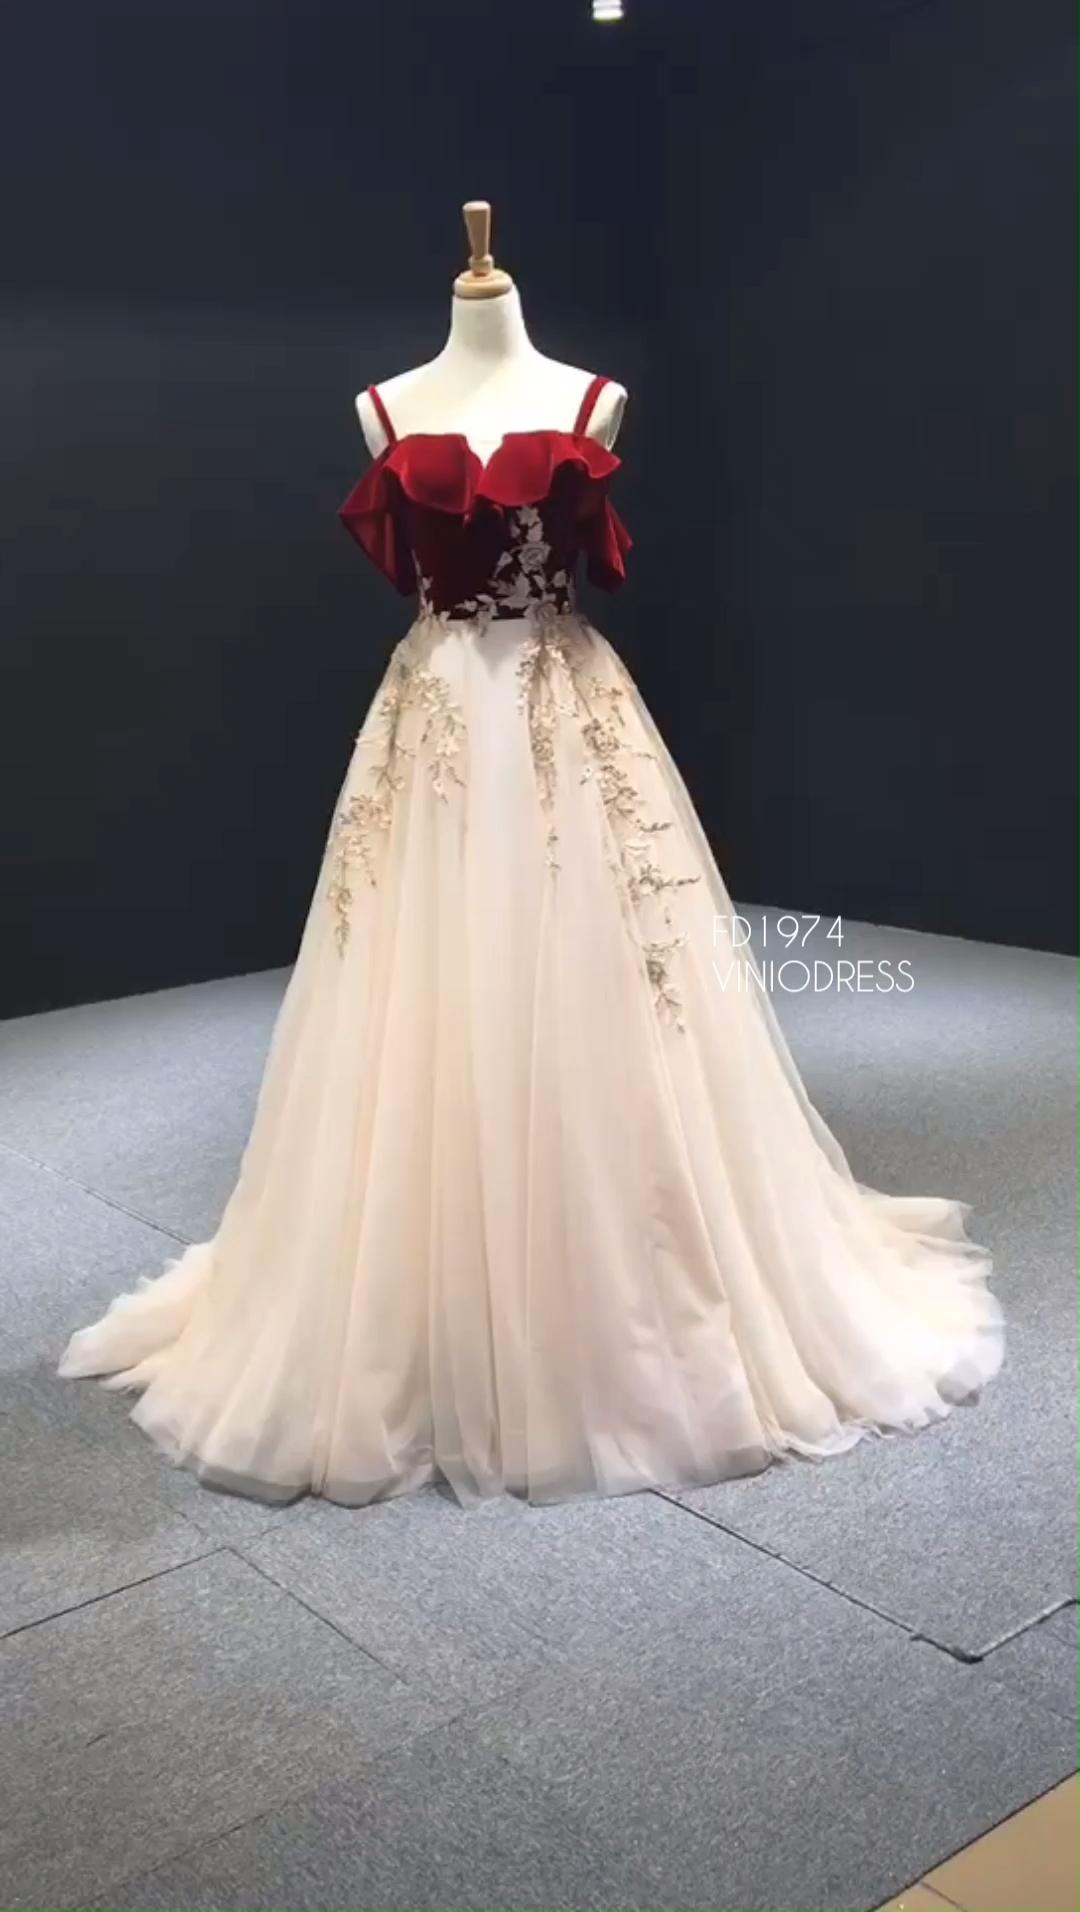 Photo of New Burgundy Velvet Long Prom Dresses with Straps FD1974 #fancydress New Burgundy …